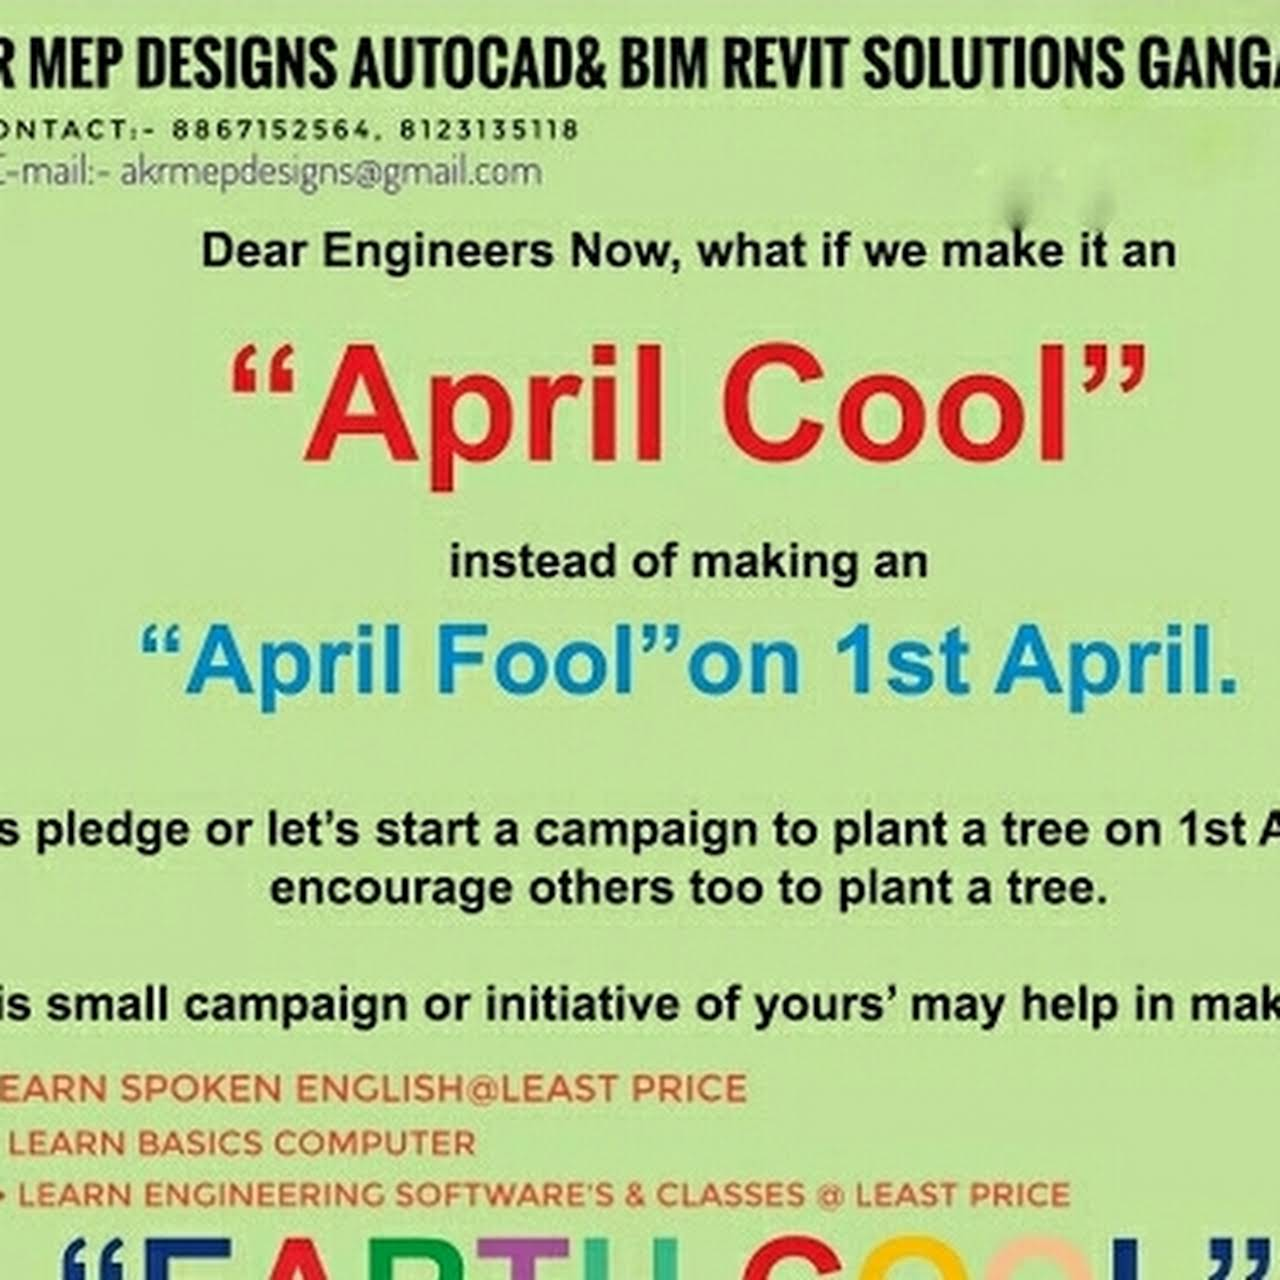 AKR MEP Designs AutoCad & BIM Revit Solutions, Institution - Email